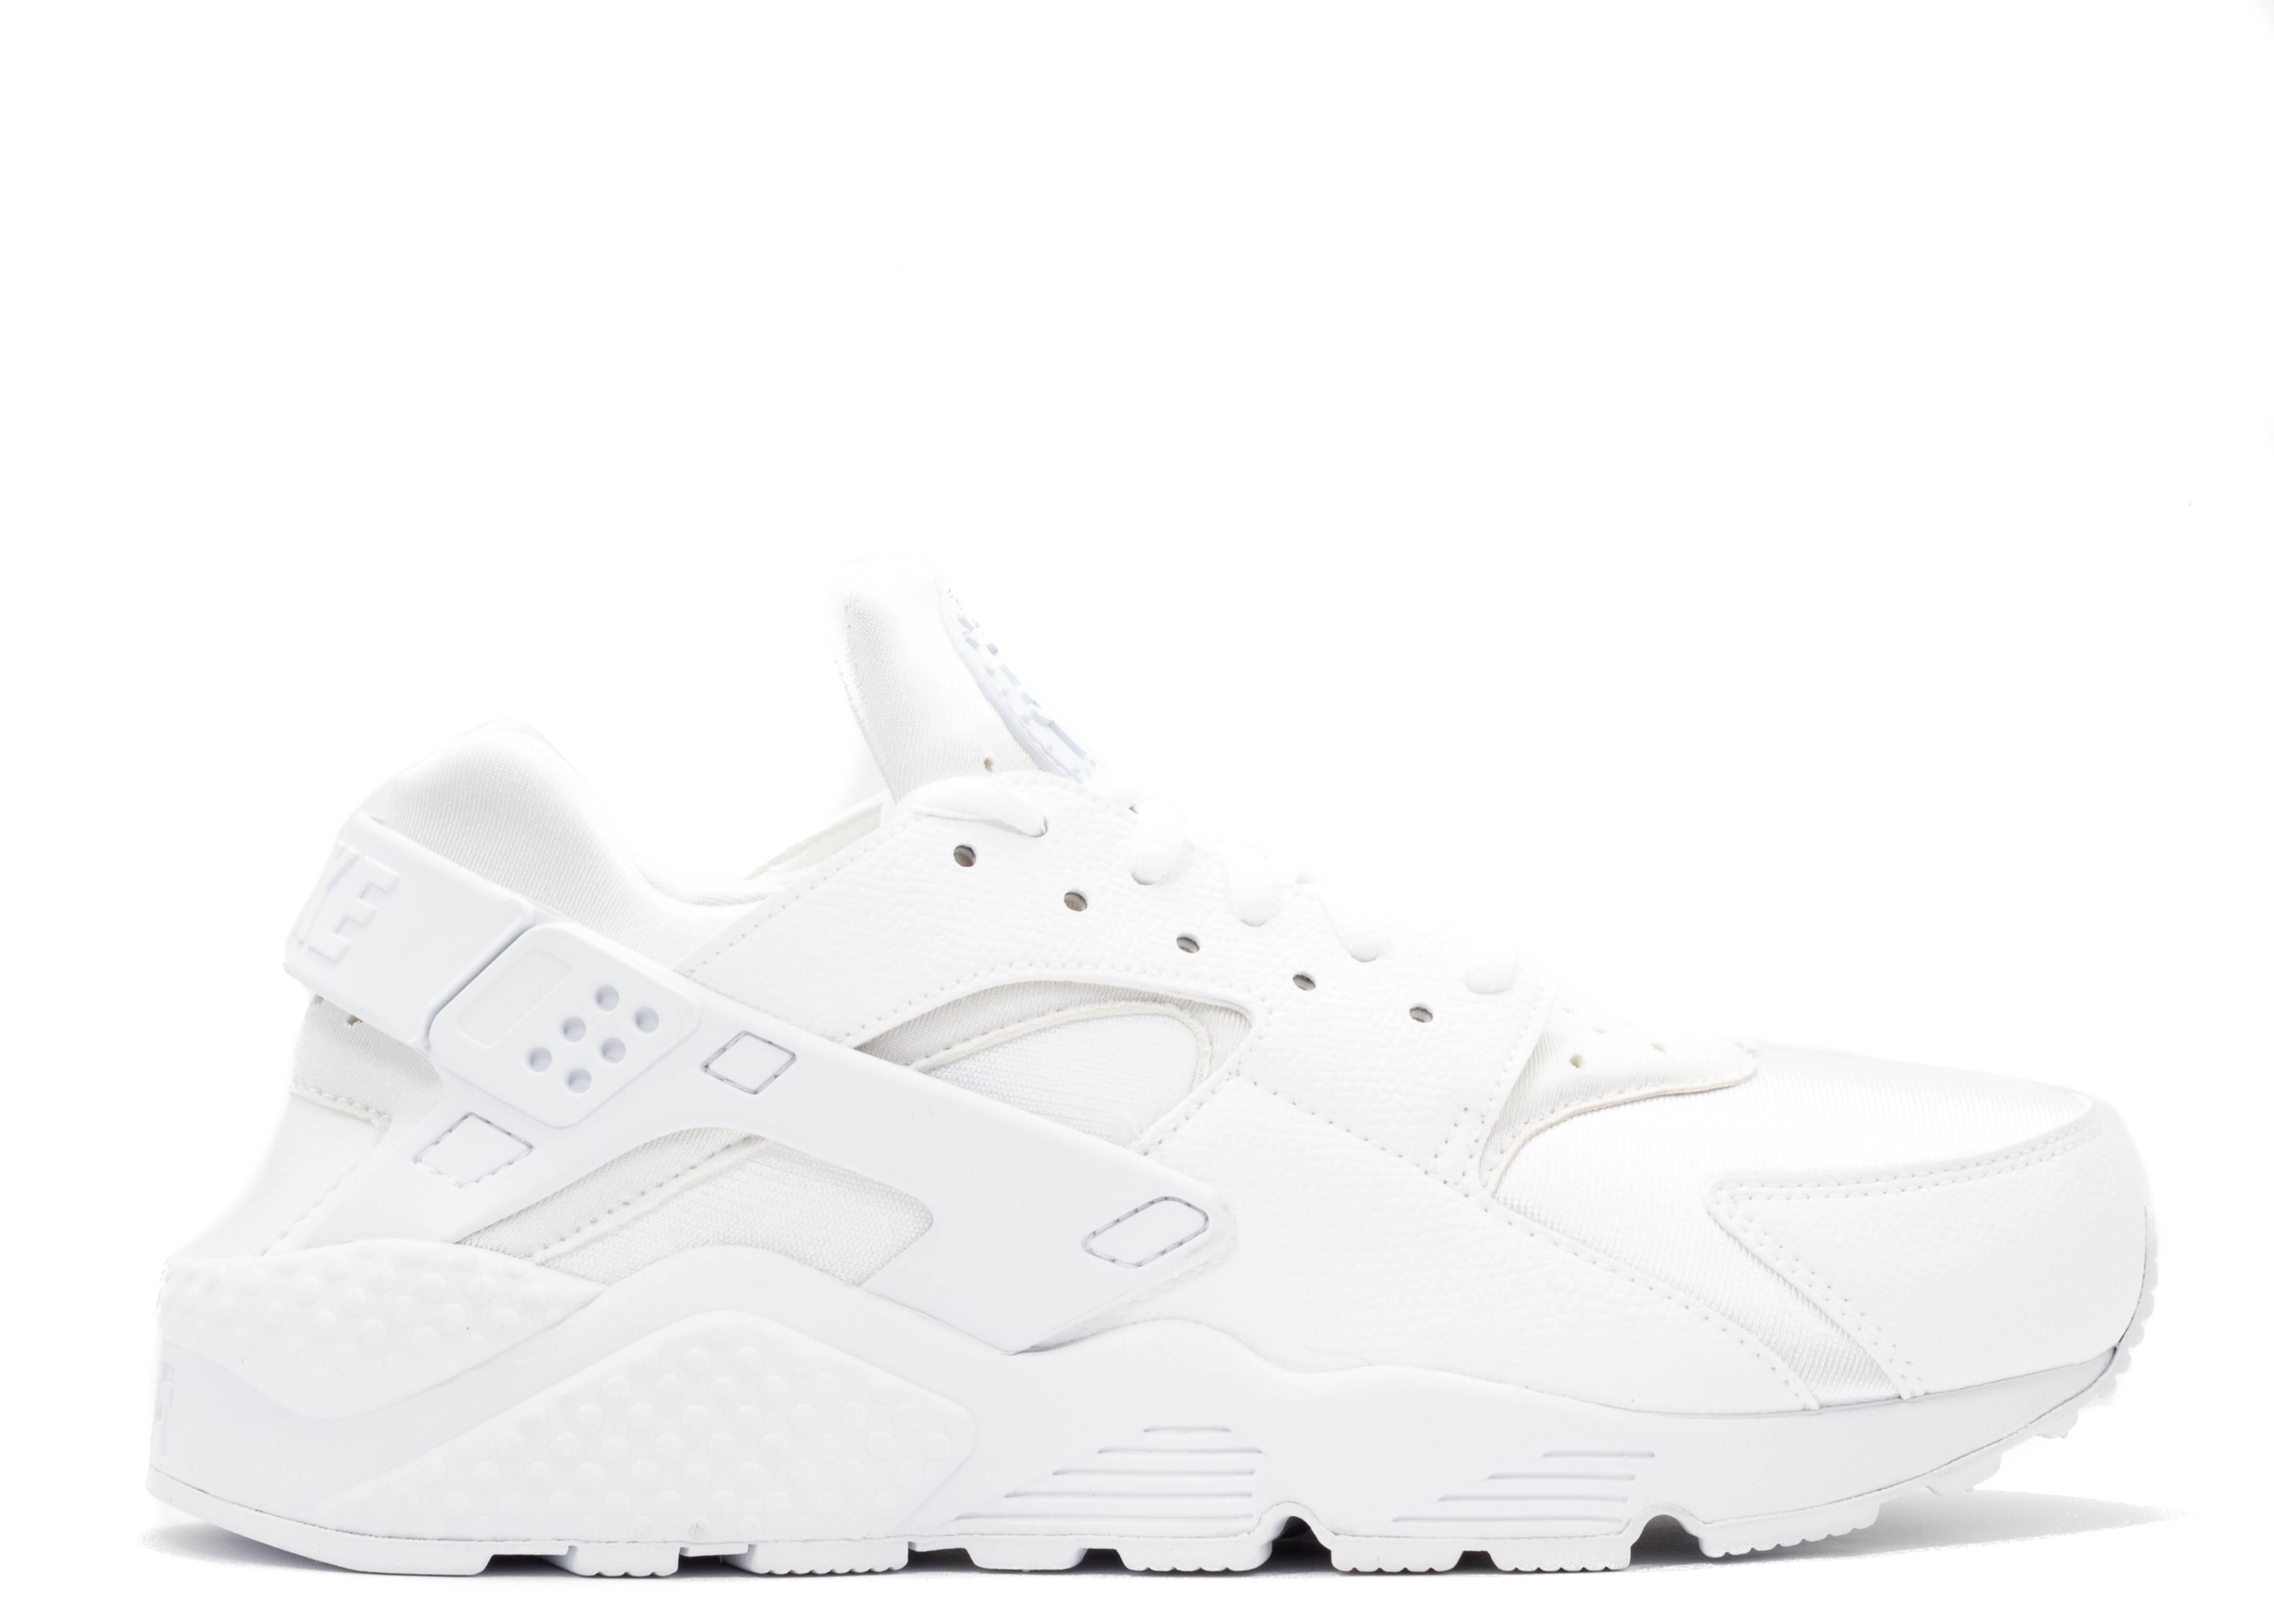 Nike Huarache Run White